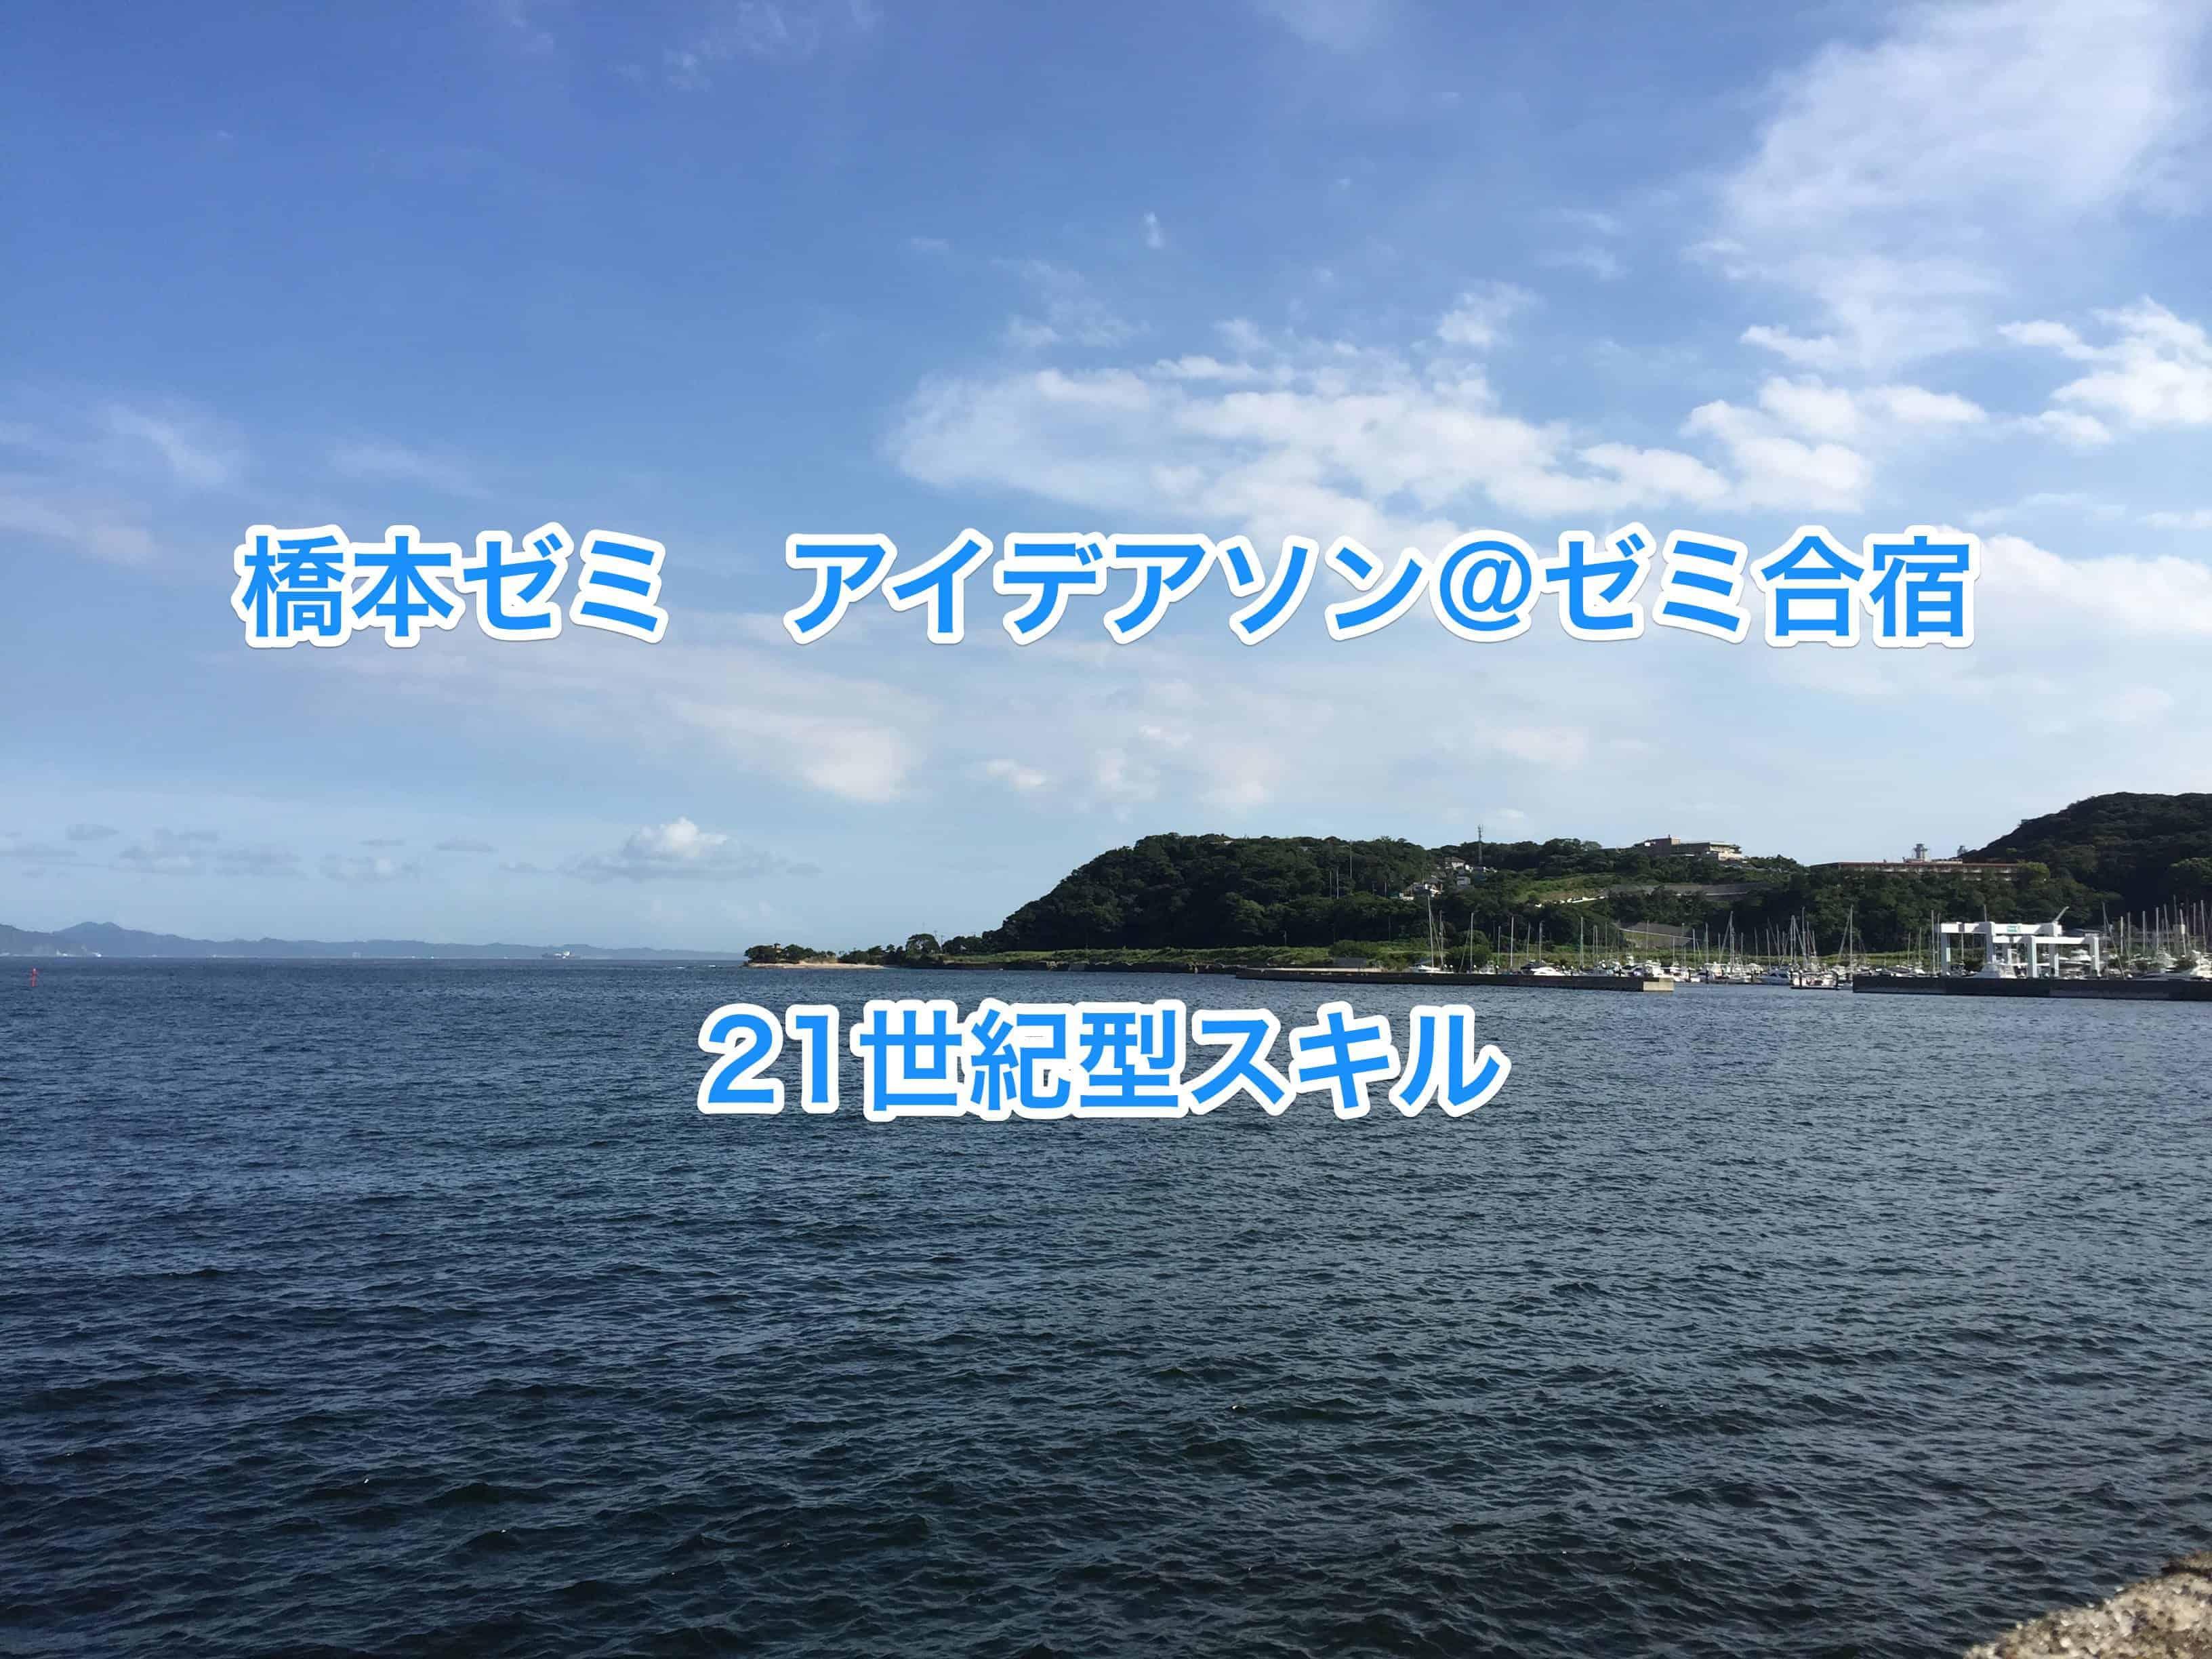 IMG 4090  1  - 第1回橋本ゼミ アイデアソン@ゼミ合宿(2015年夏)